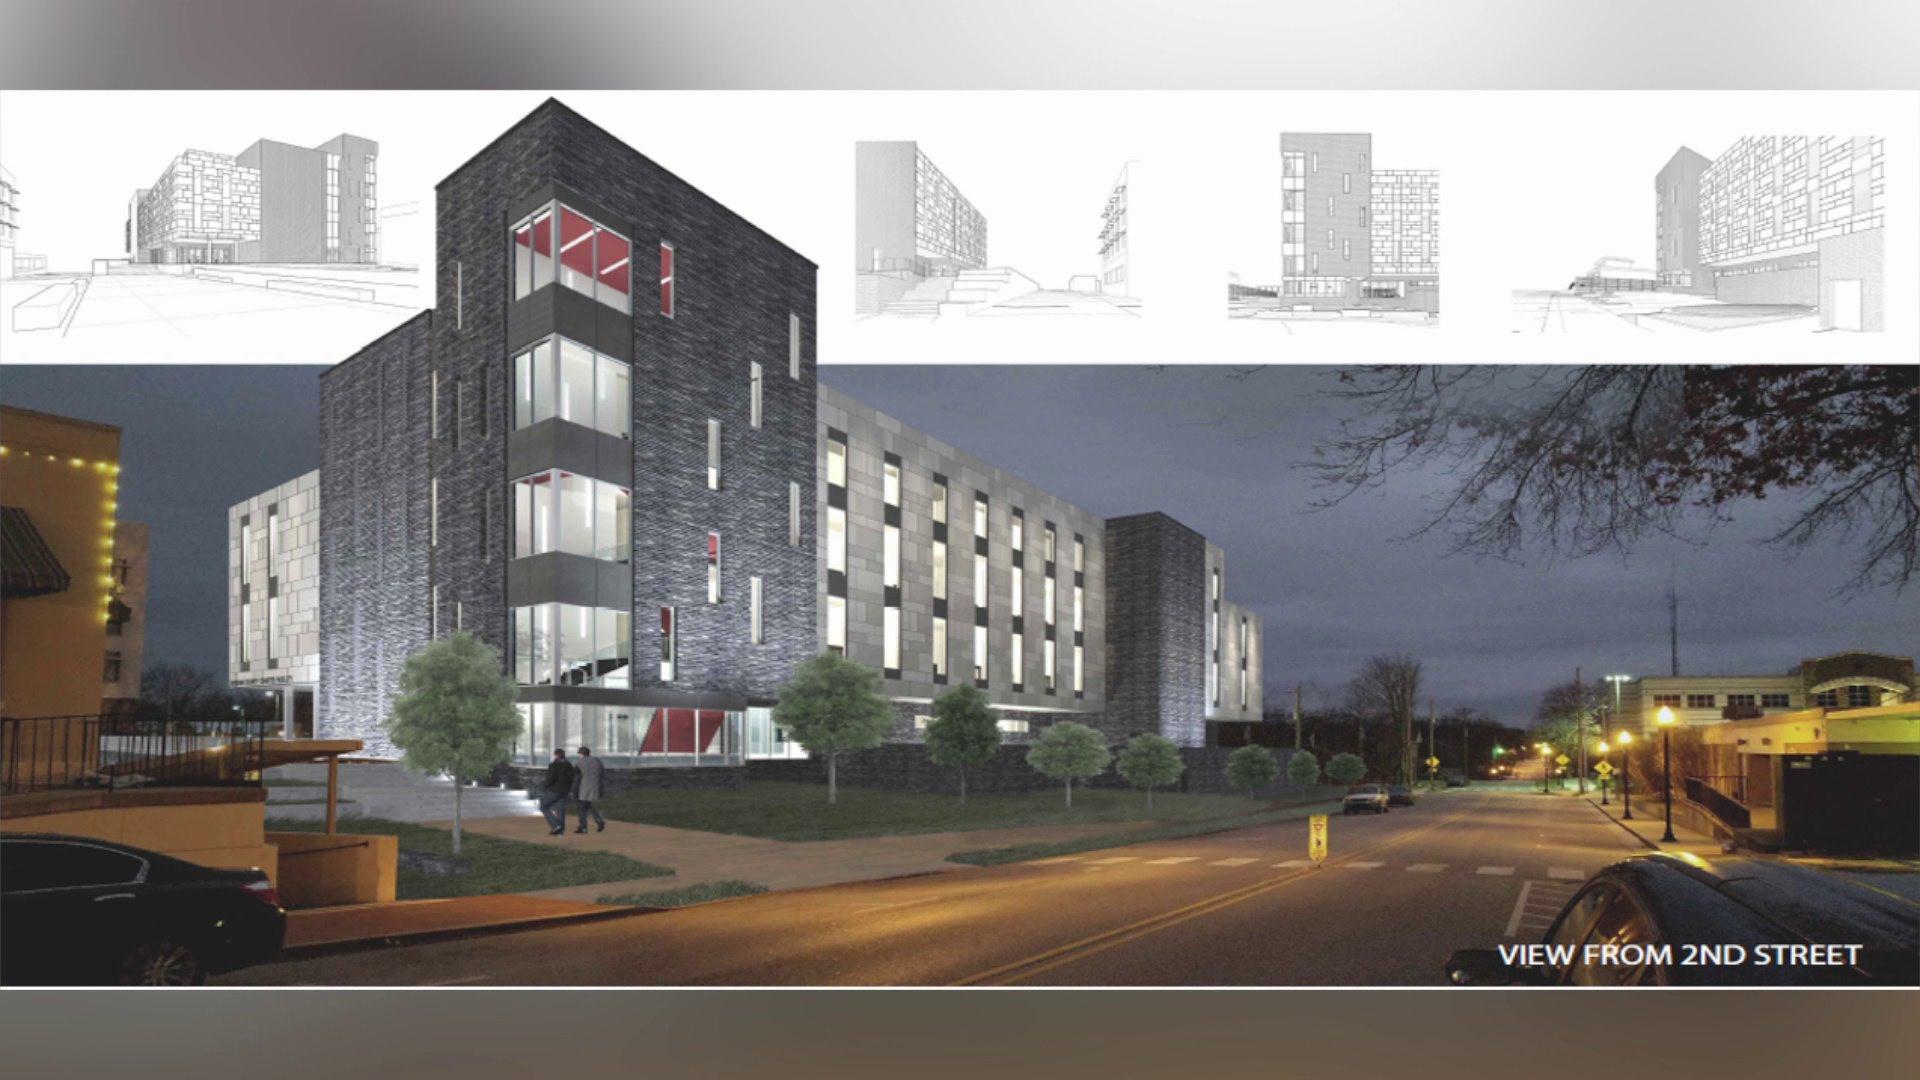 Benton County Courts Building renderings